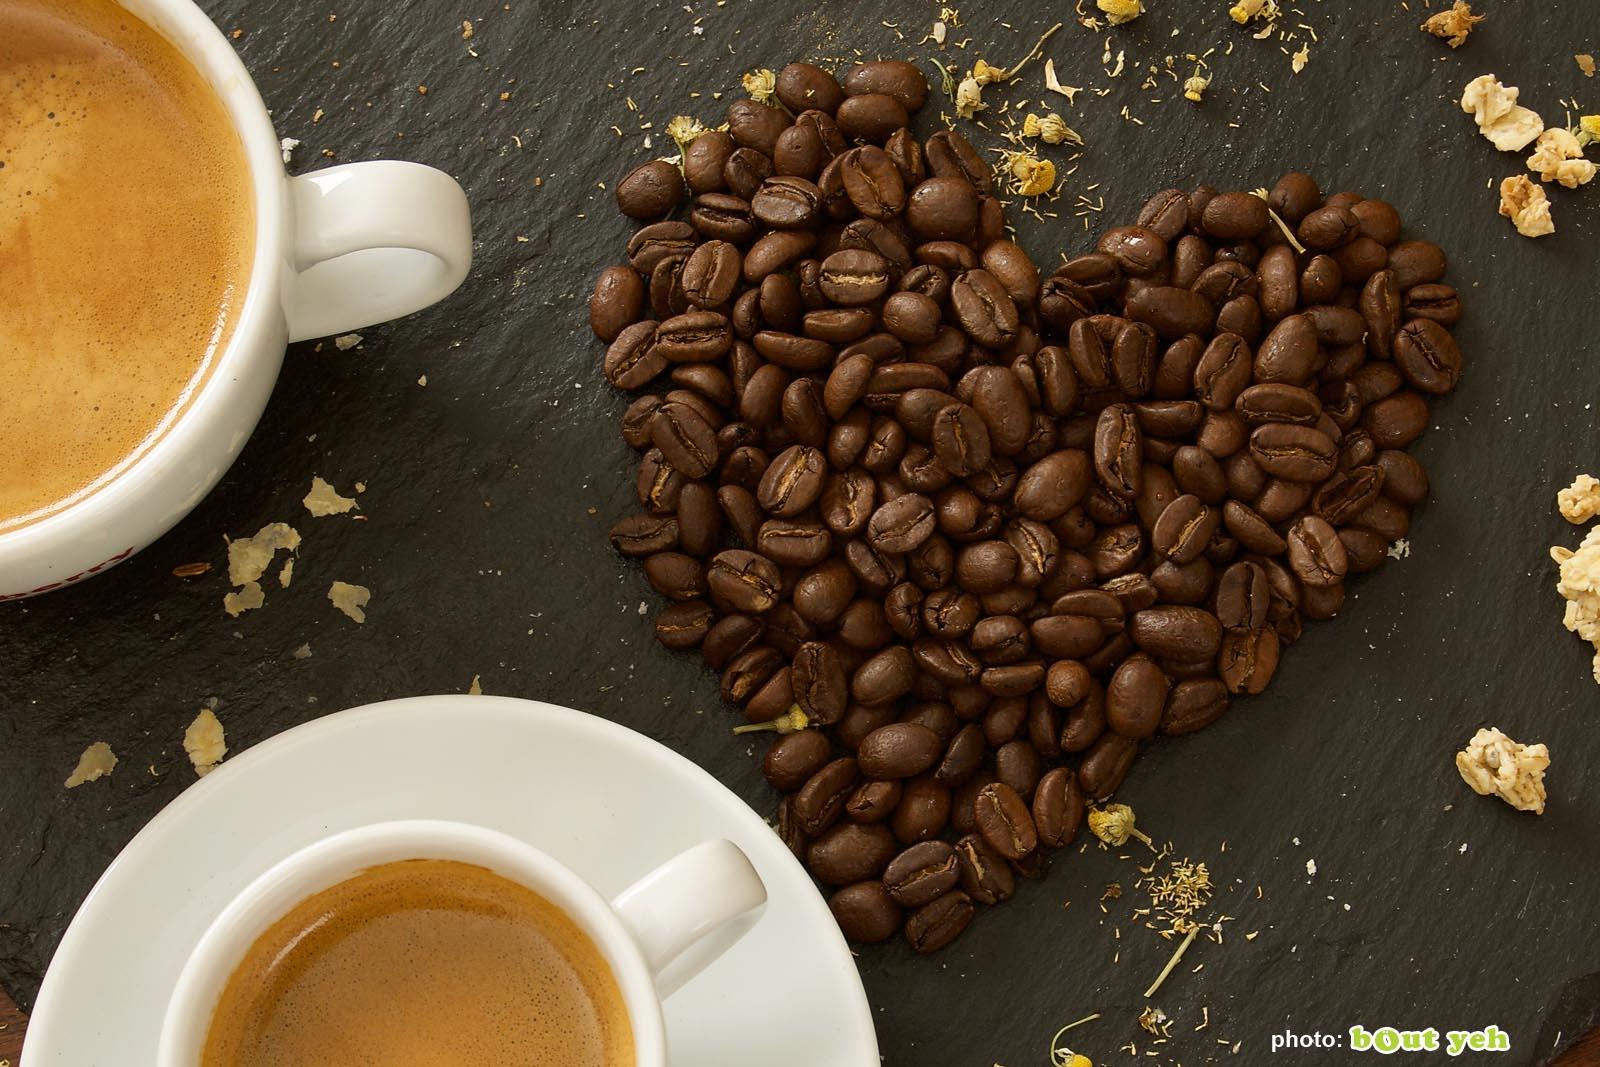 Food photographers Belfast portfolio photo 1410 - coffee beans in heart shape